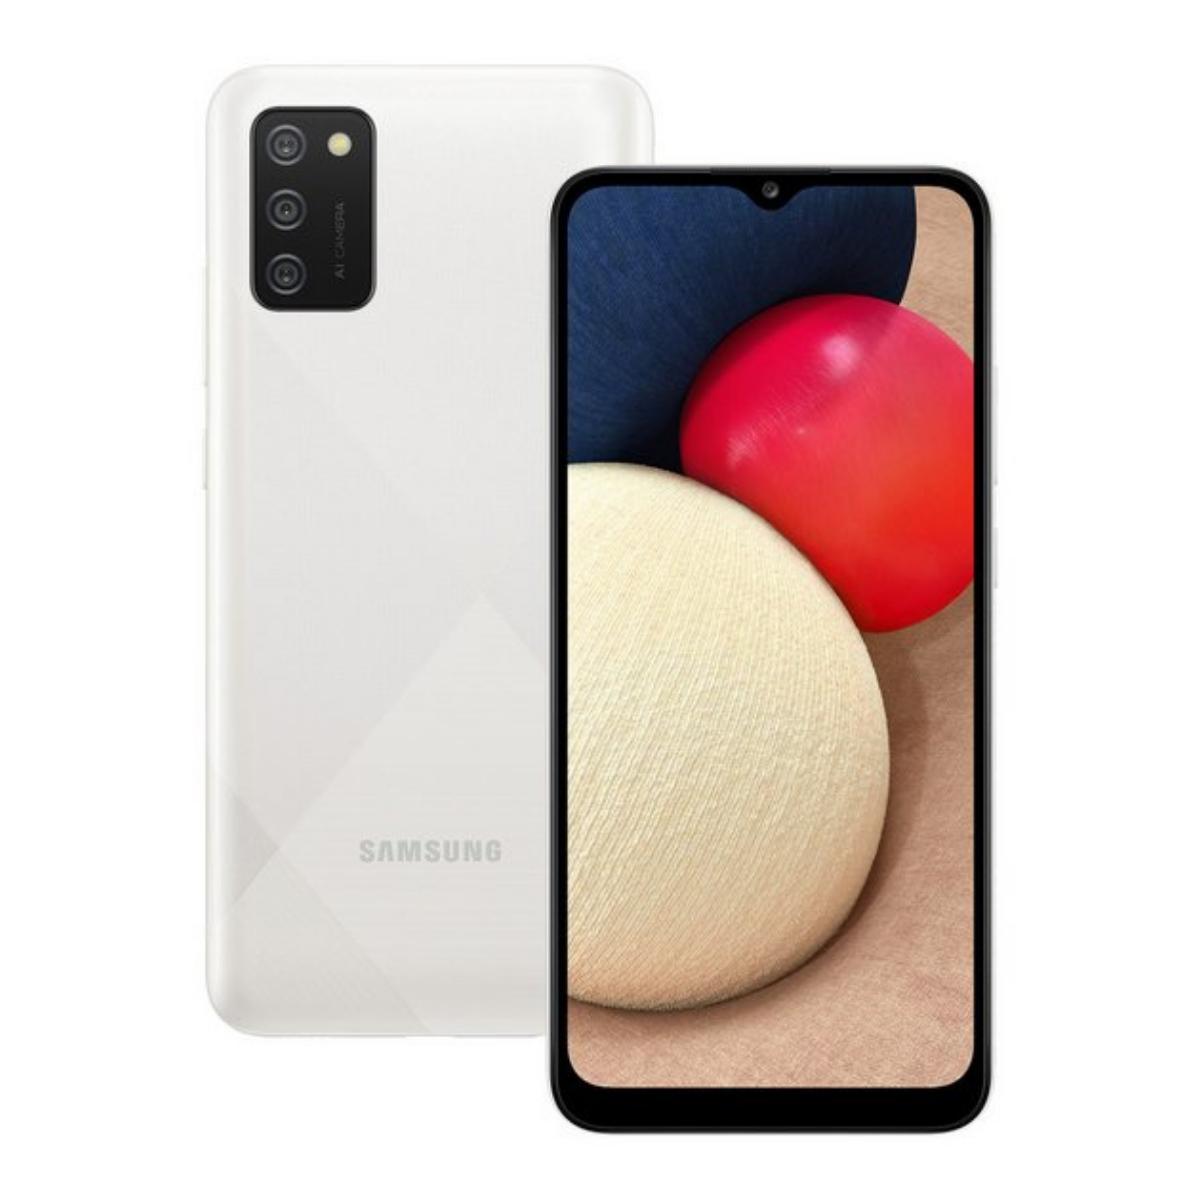 Sim Free Samsung Galaxy A02s 32GB Mobile Phone - White